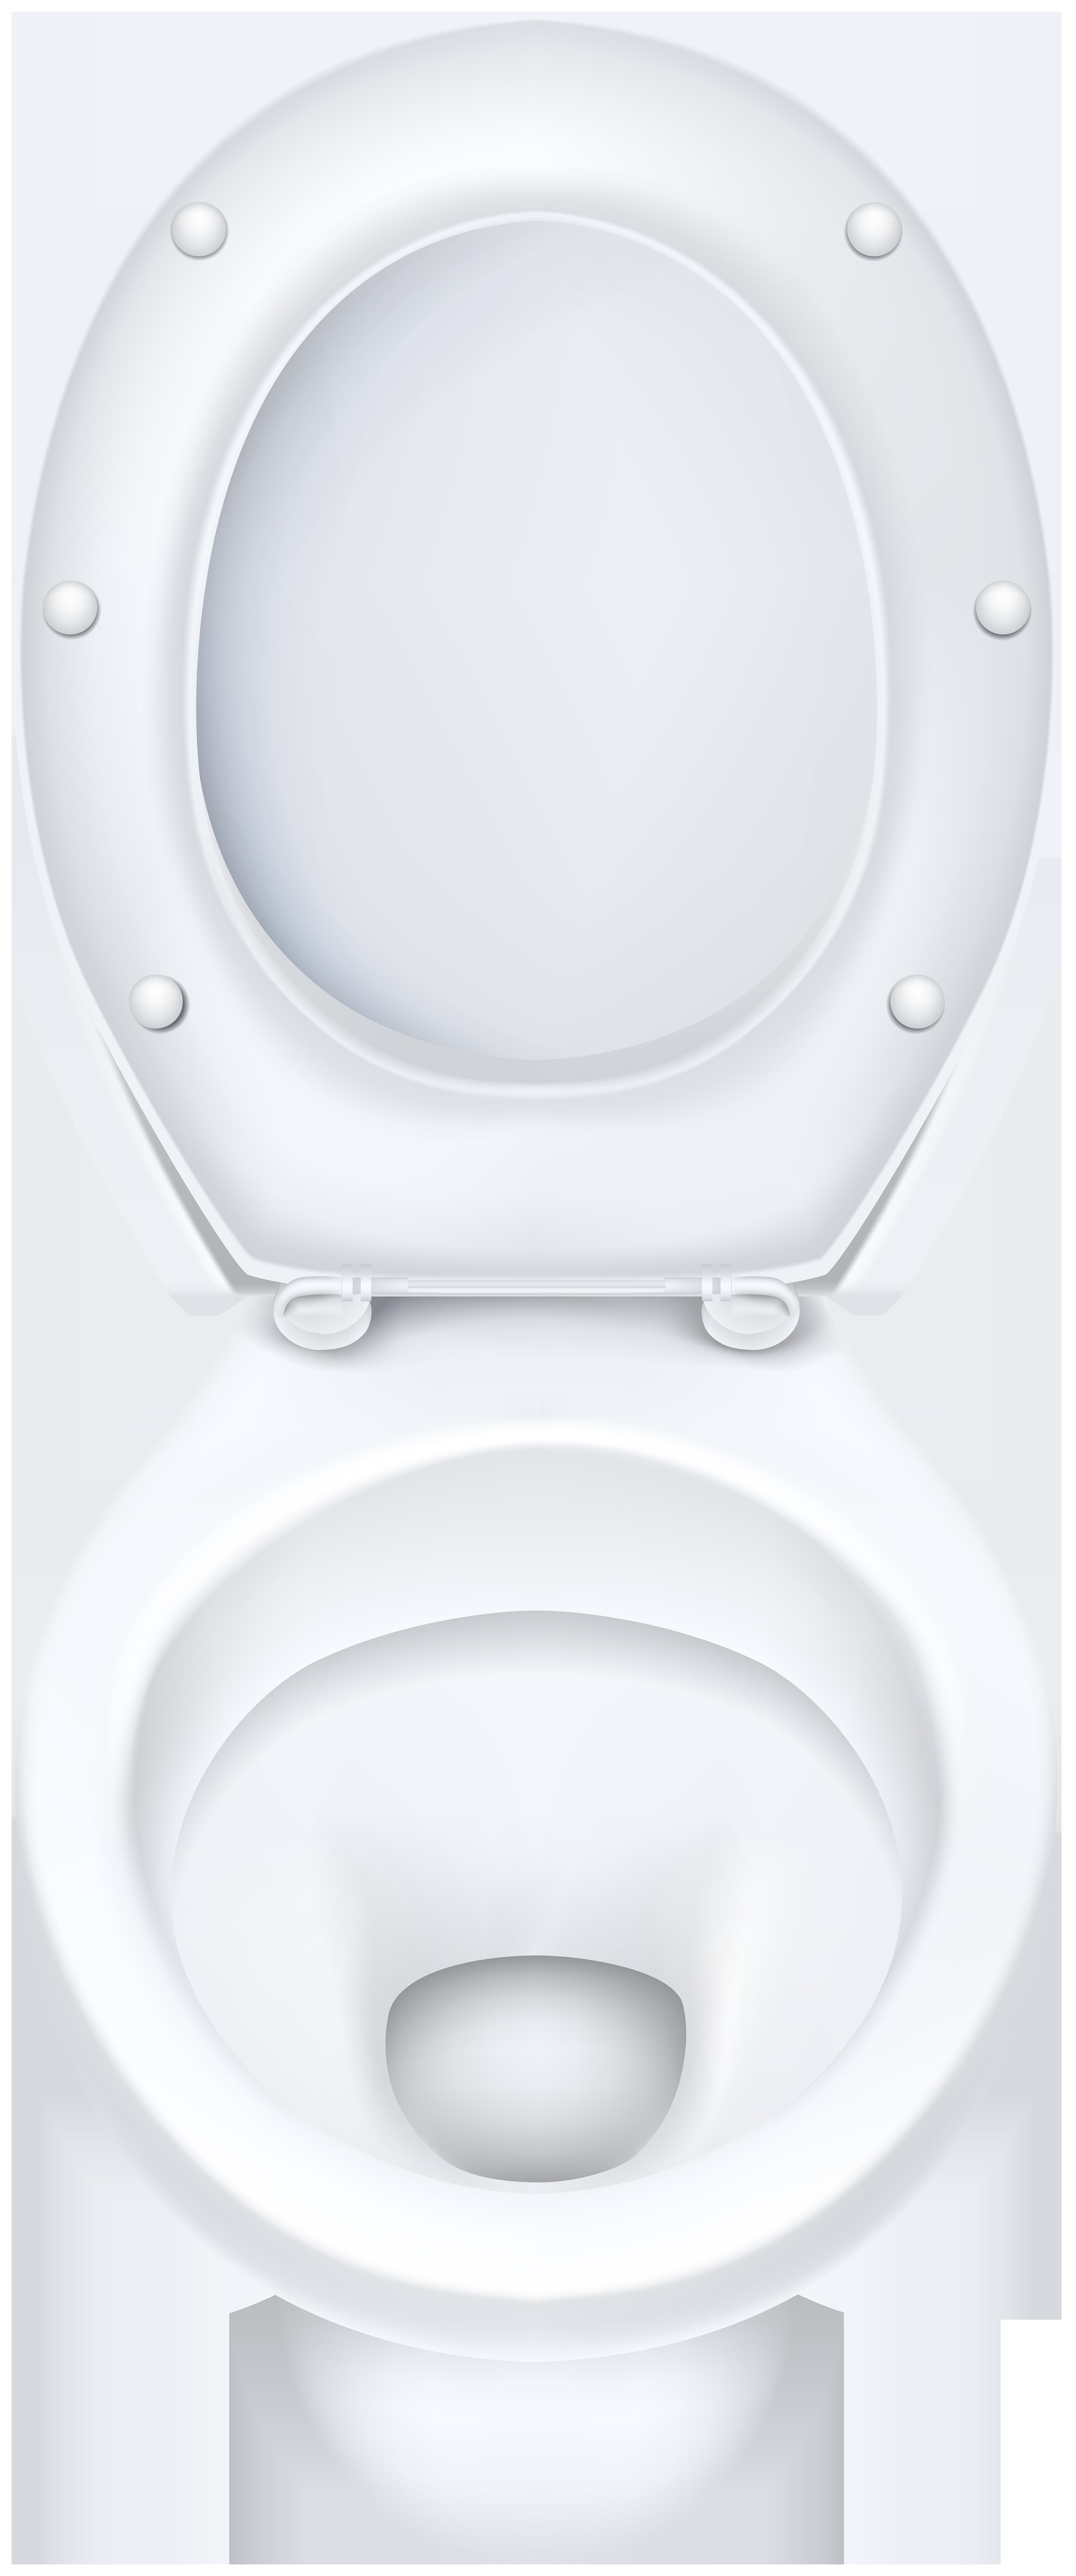 Bowl with money under it clipart clip free White Toilet Bowl PNG Clip Art - Best WEB Clipart clip free